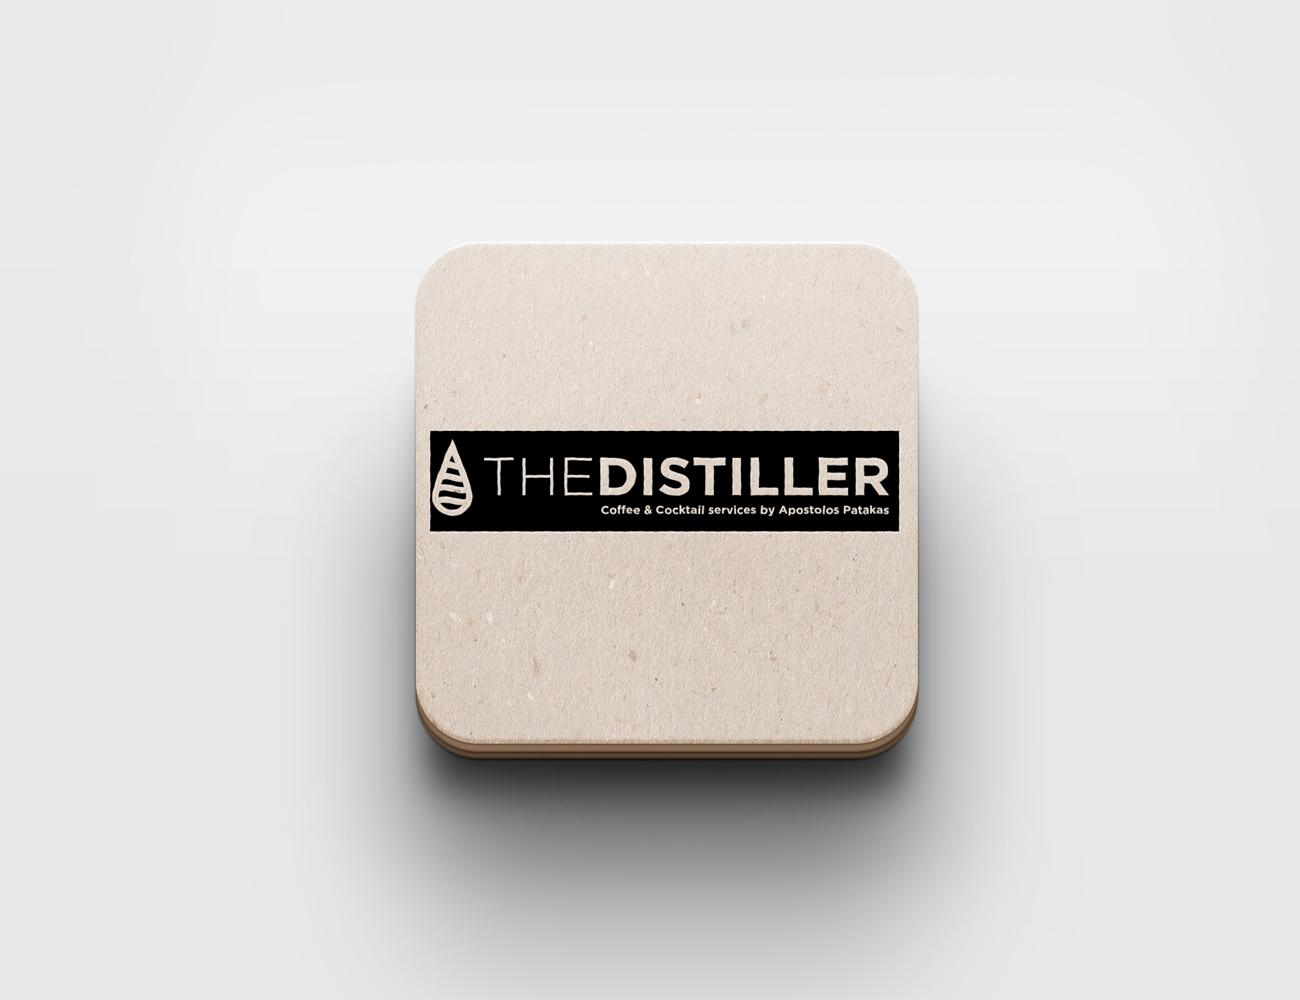 thedistillerpackagingdesign1